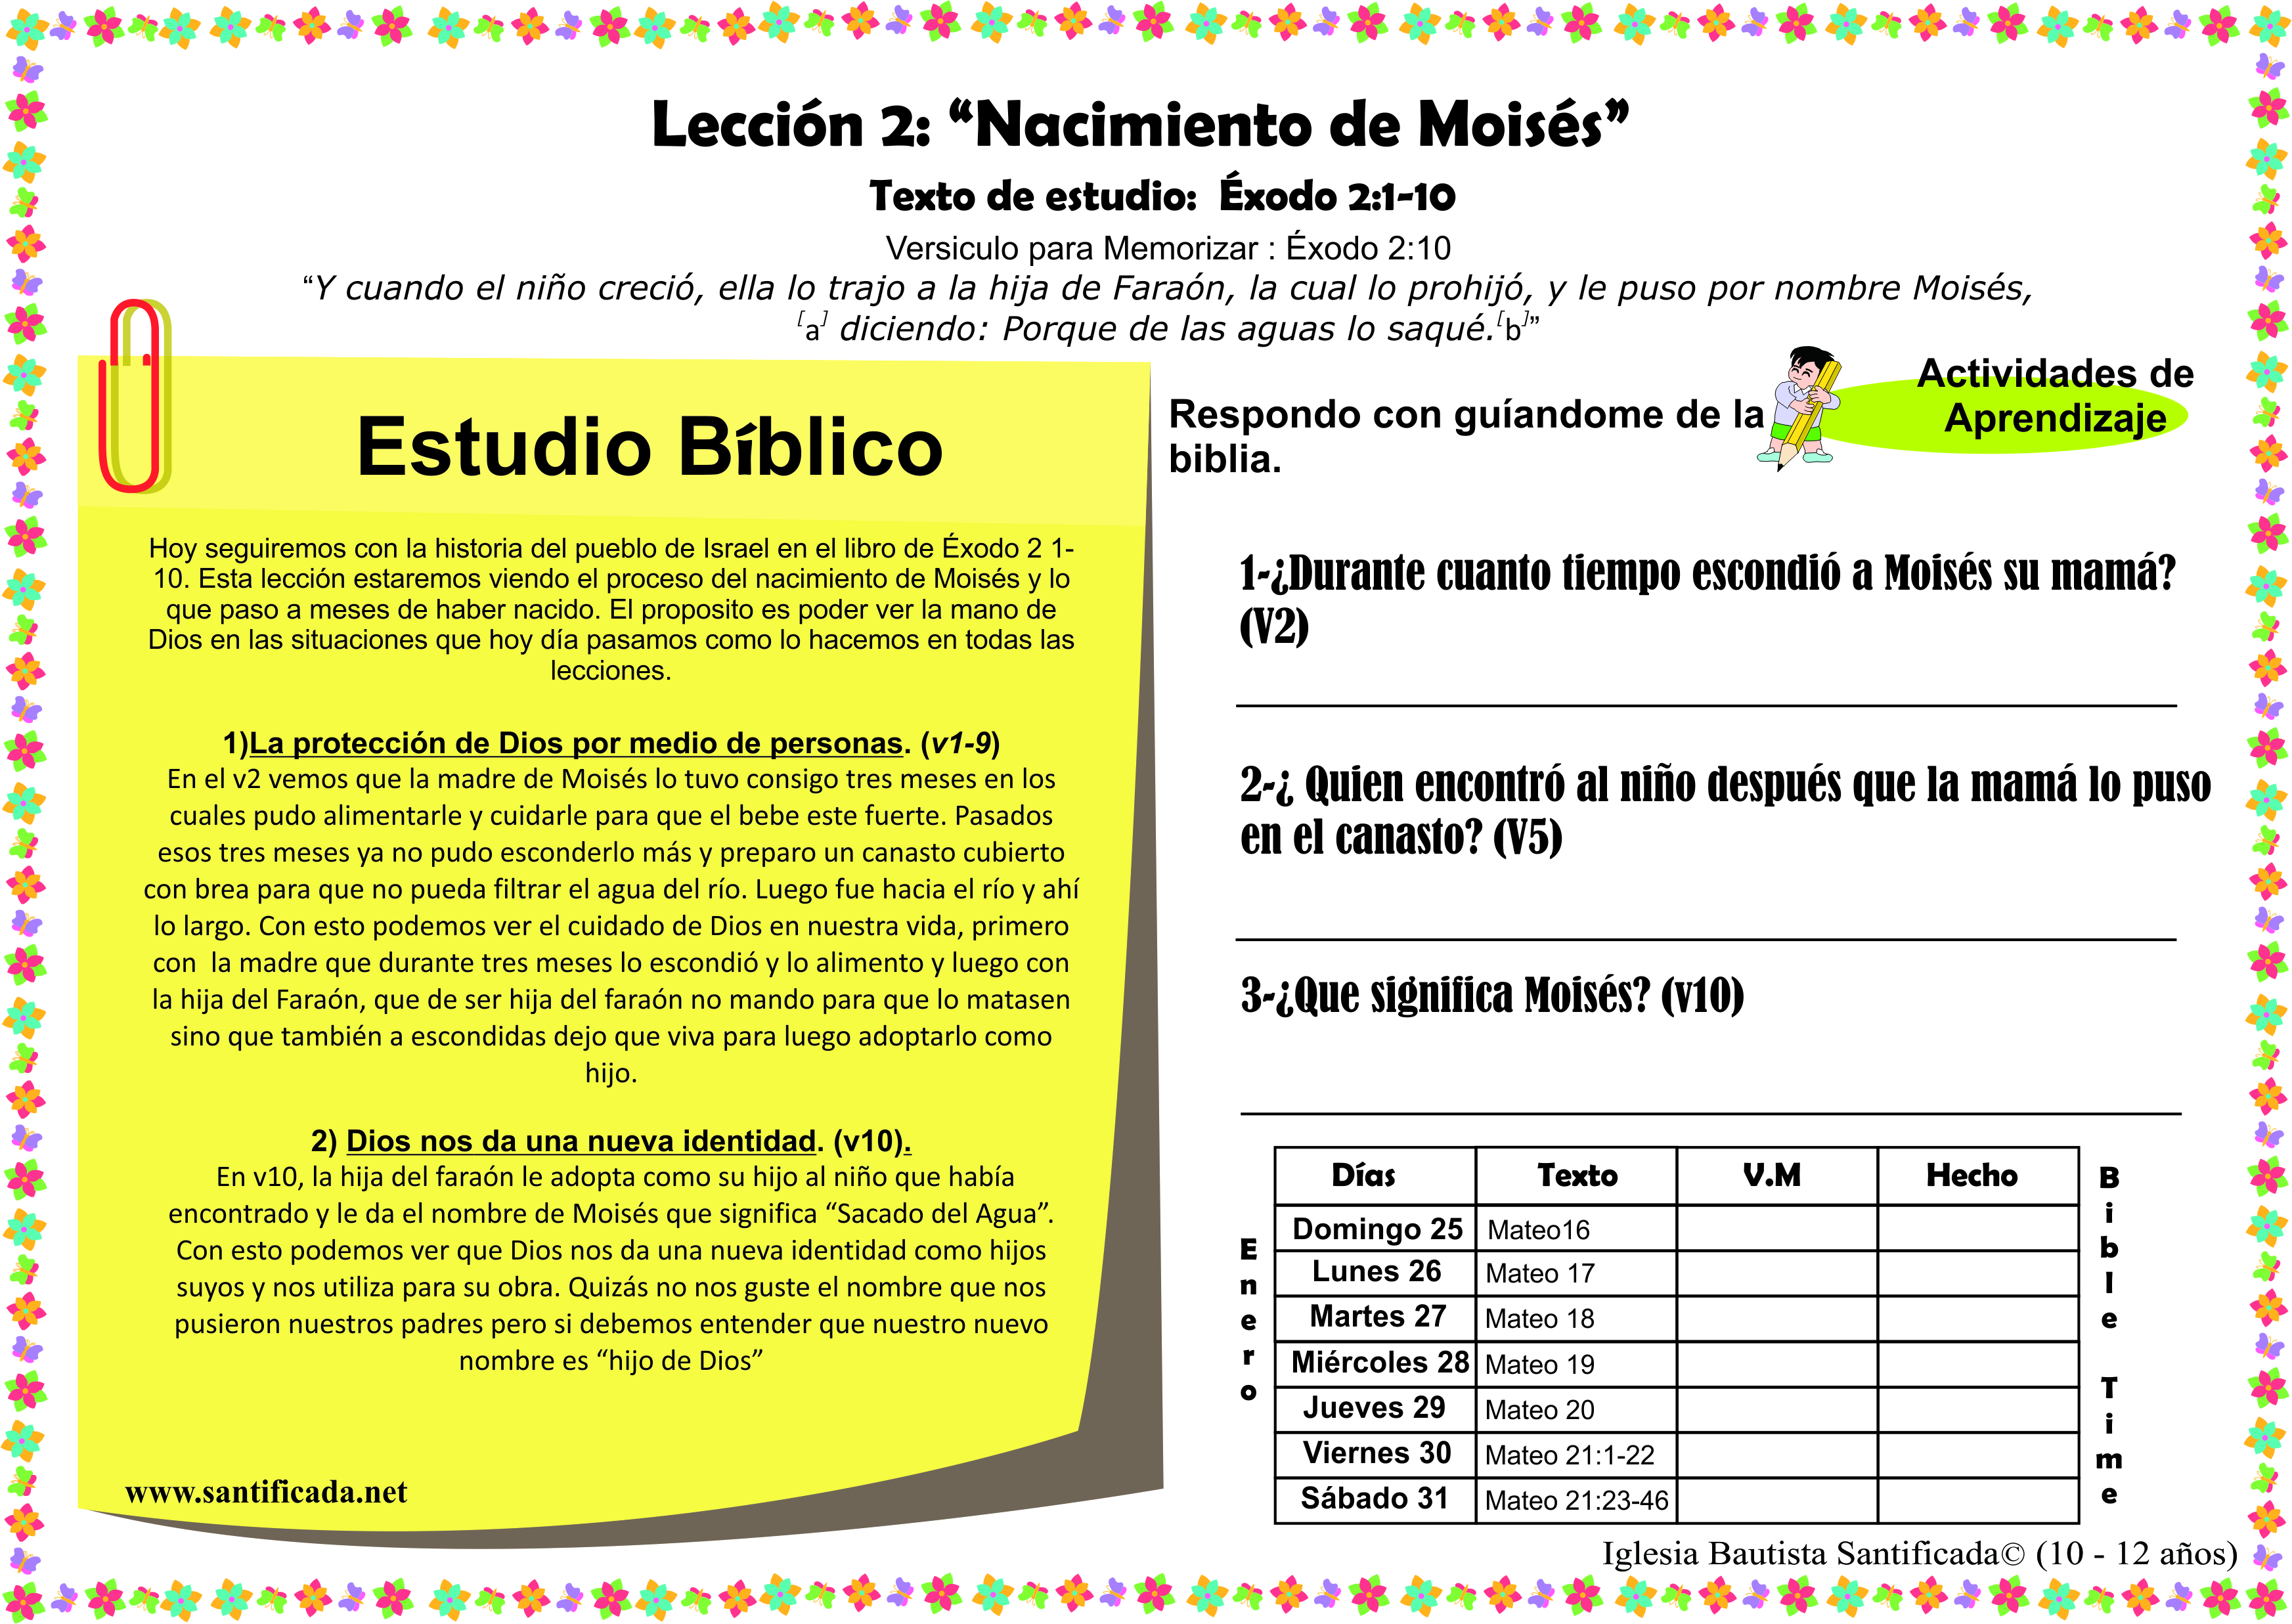 Lecci n 2 nacimiento de mois s iglesia de ni os for Lecciones de castorama de bricolaje